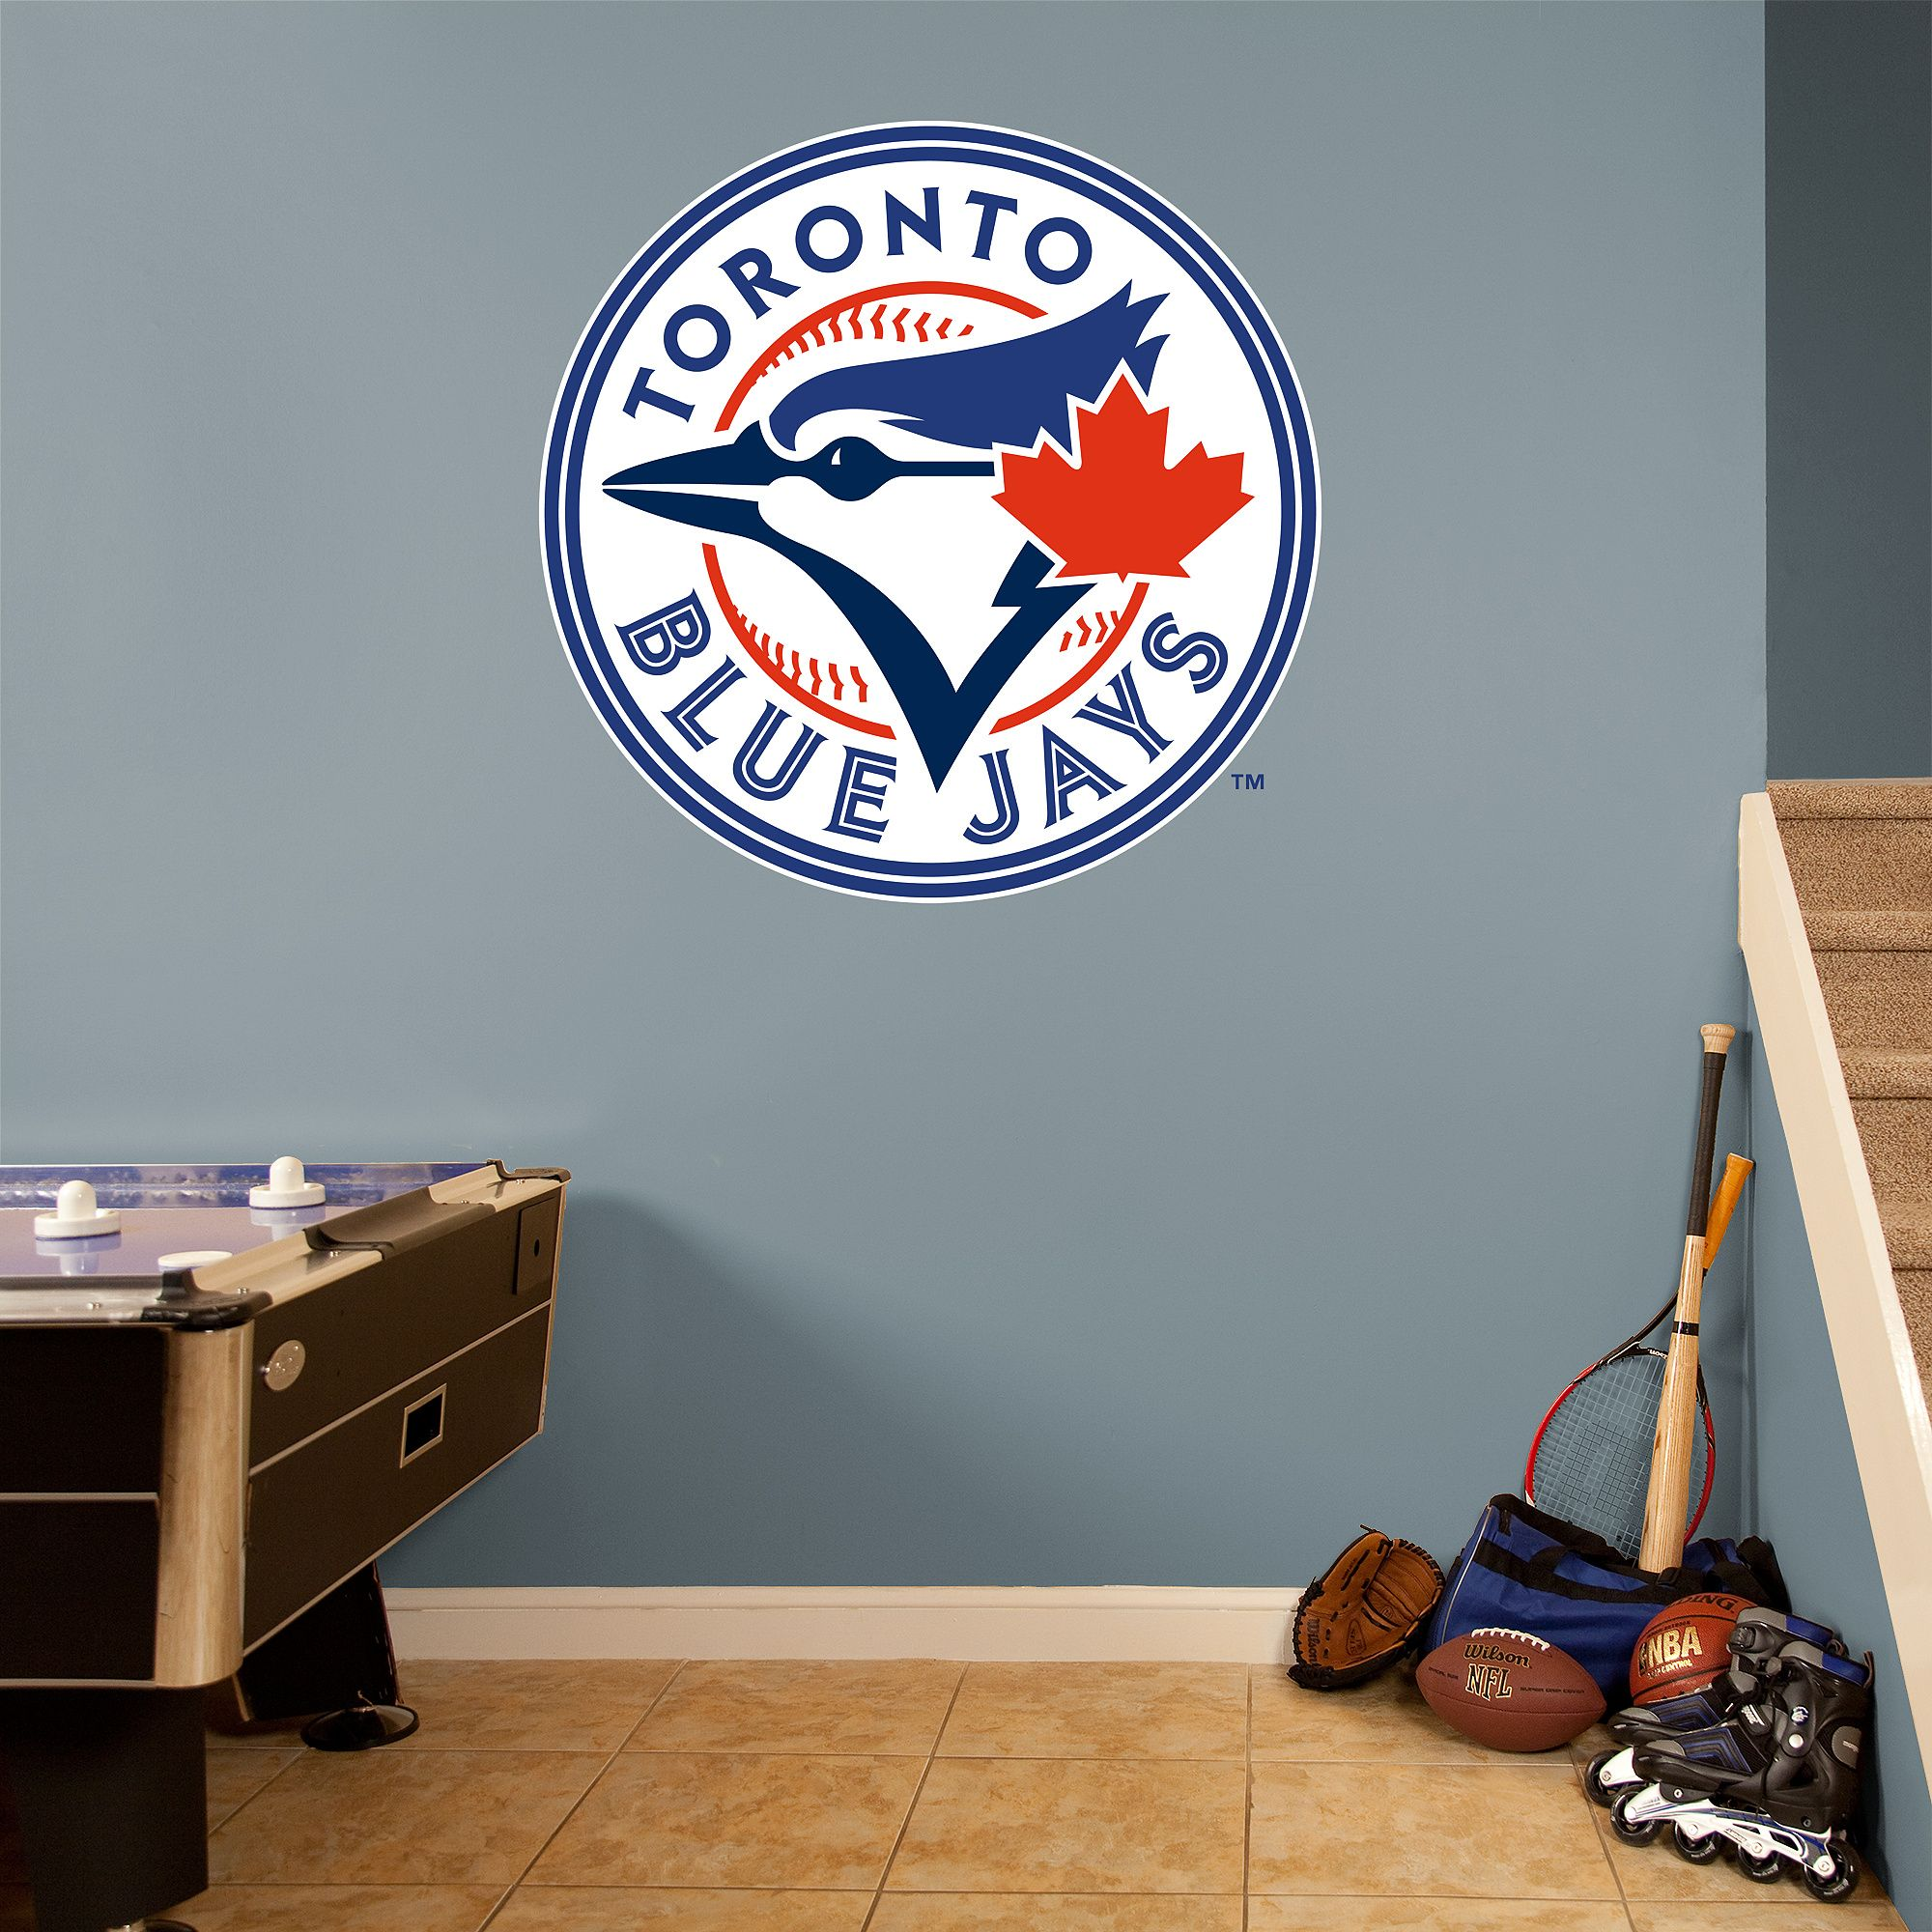 New York Yankees Bedroom Decor Toronto Blue Jays Logo Logos Baseball And Blue